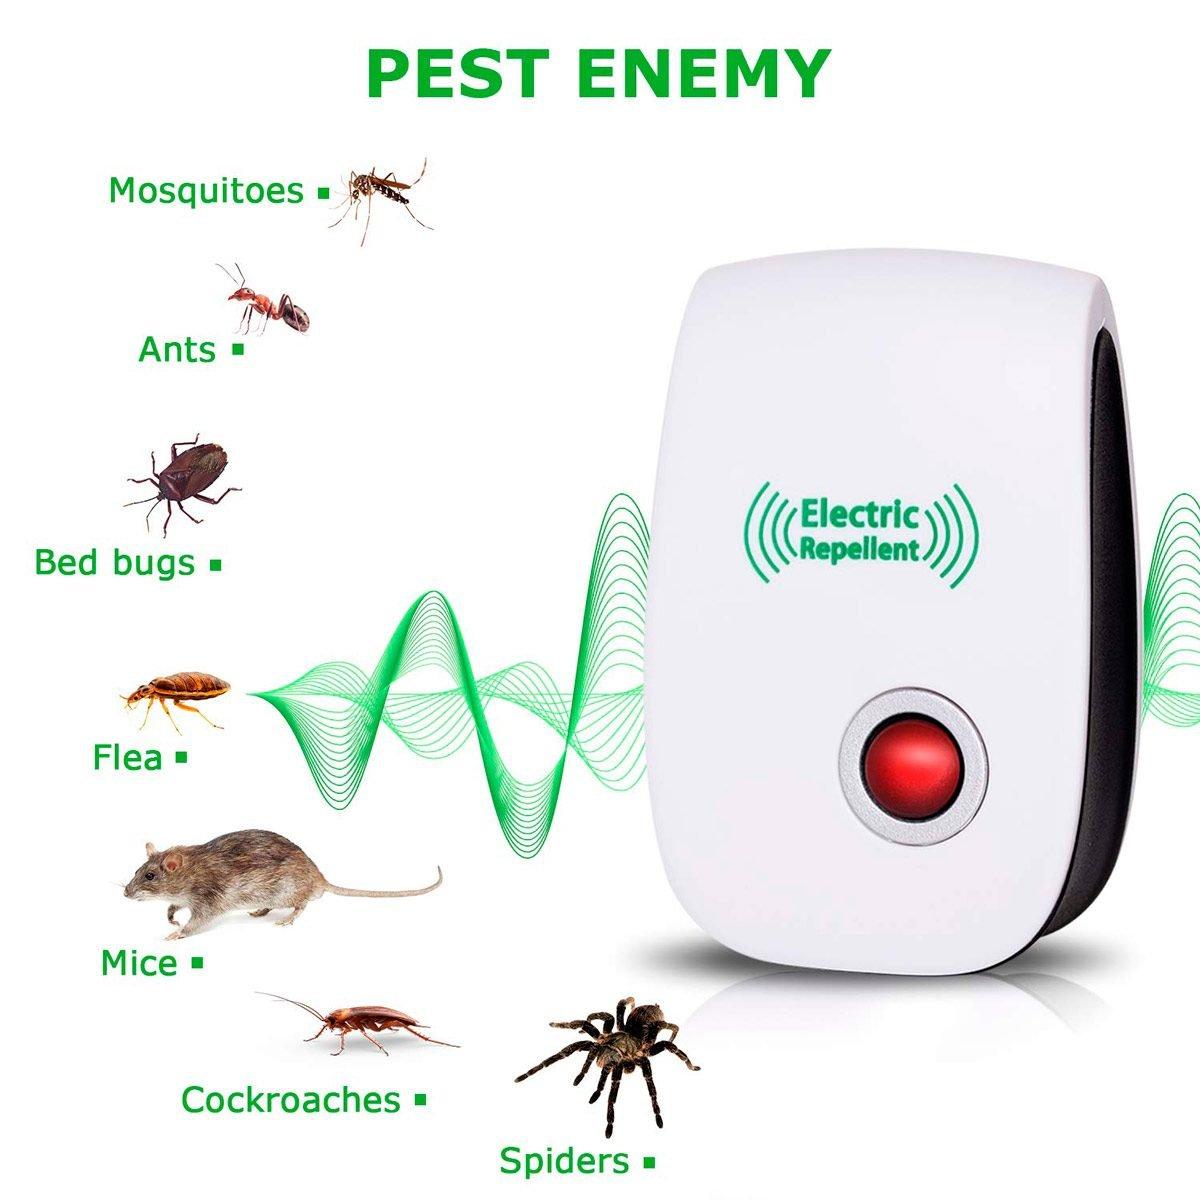 Ultrasonic Pest Control: Does it Really Work? | Family Handyman